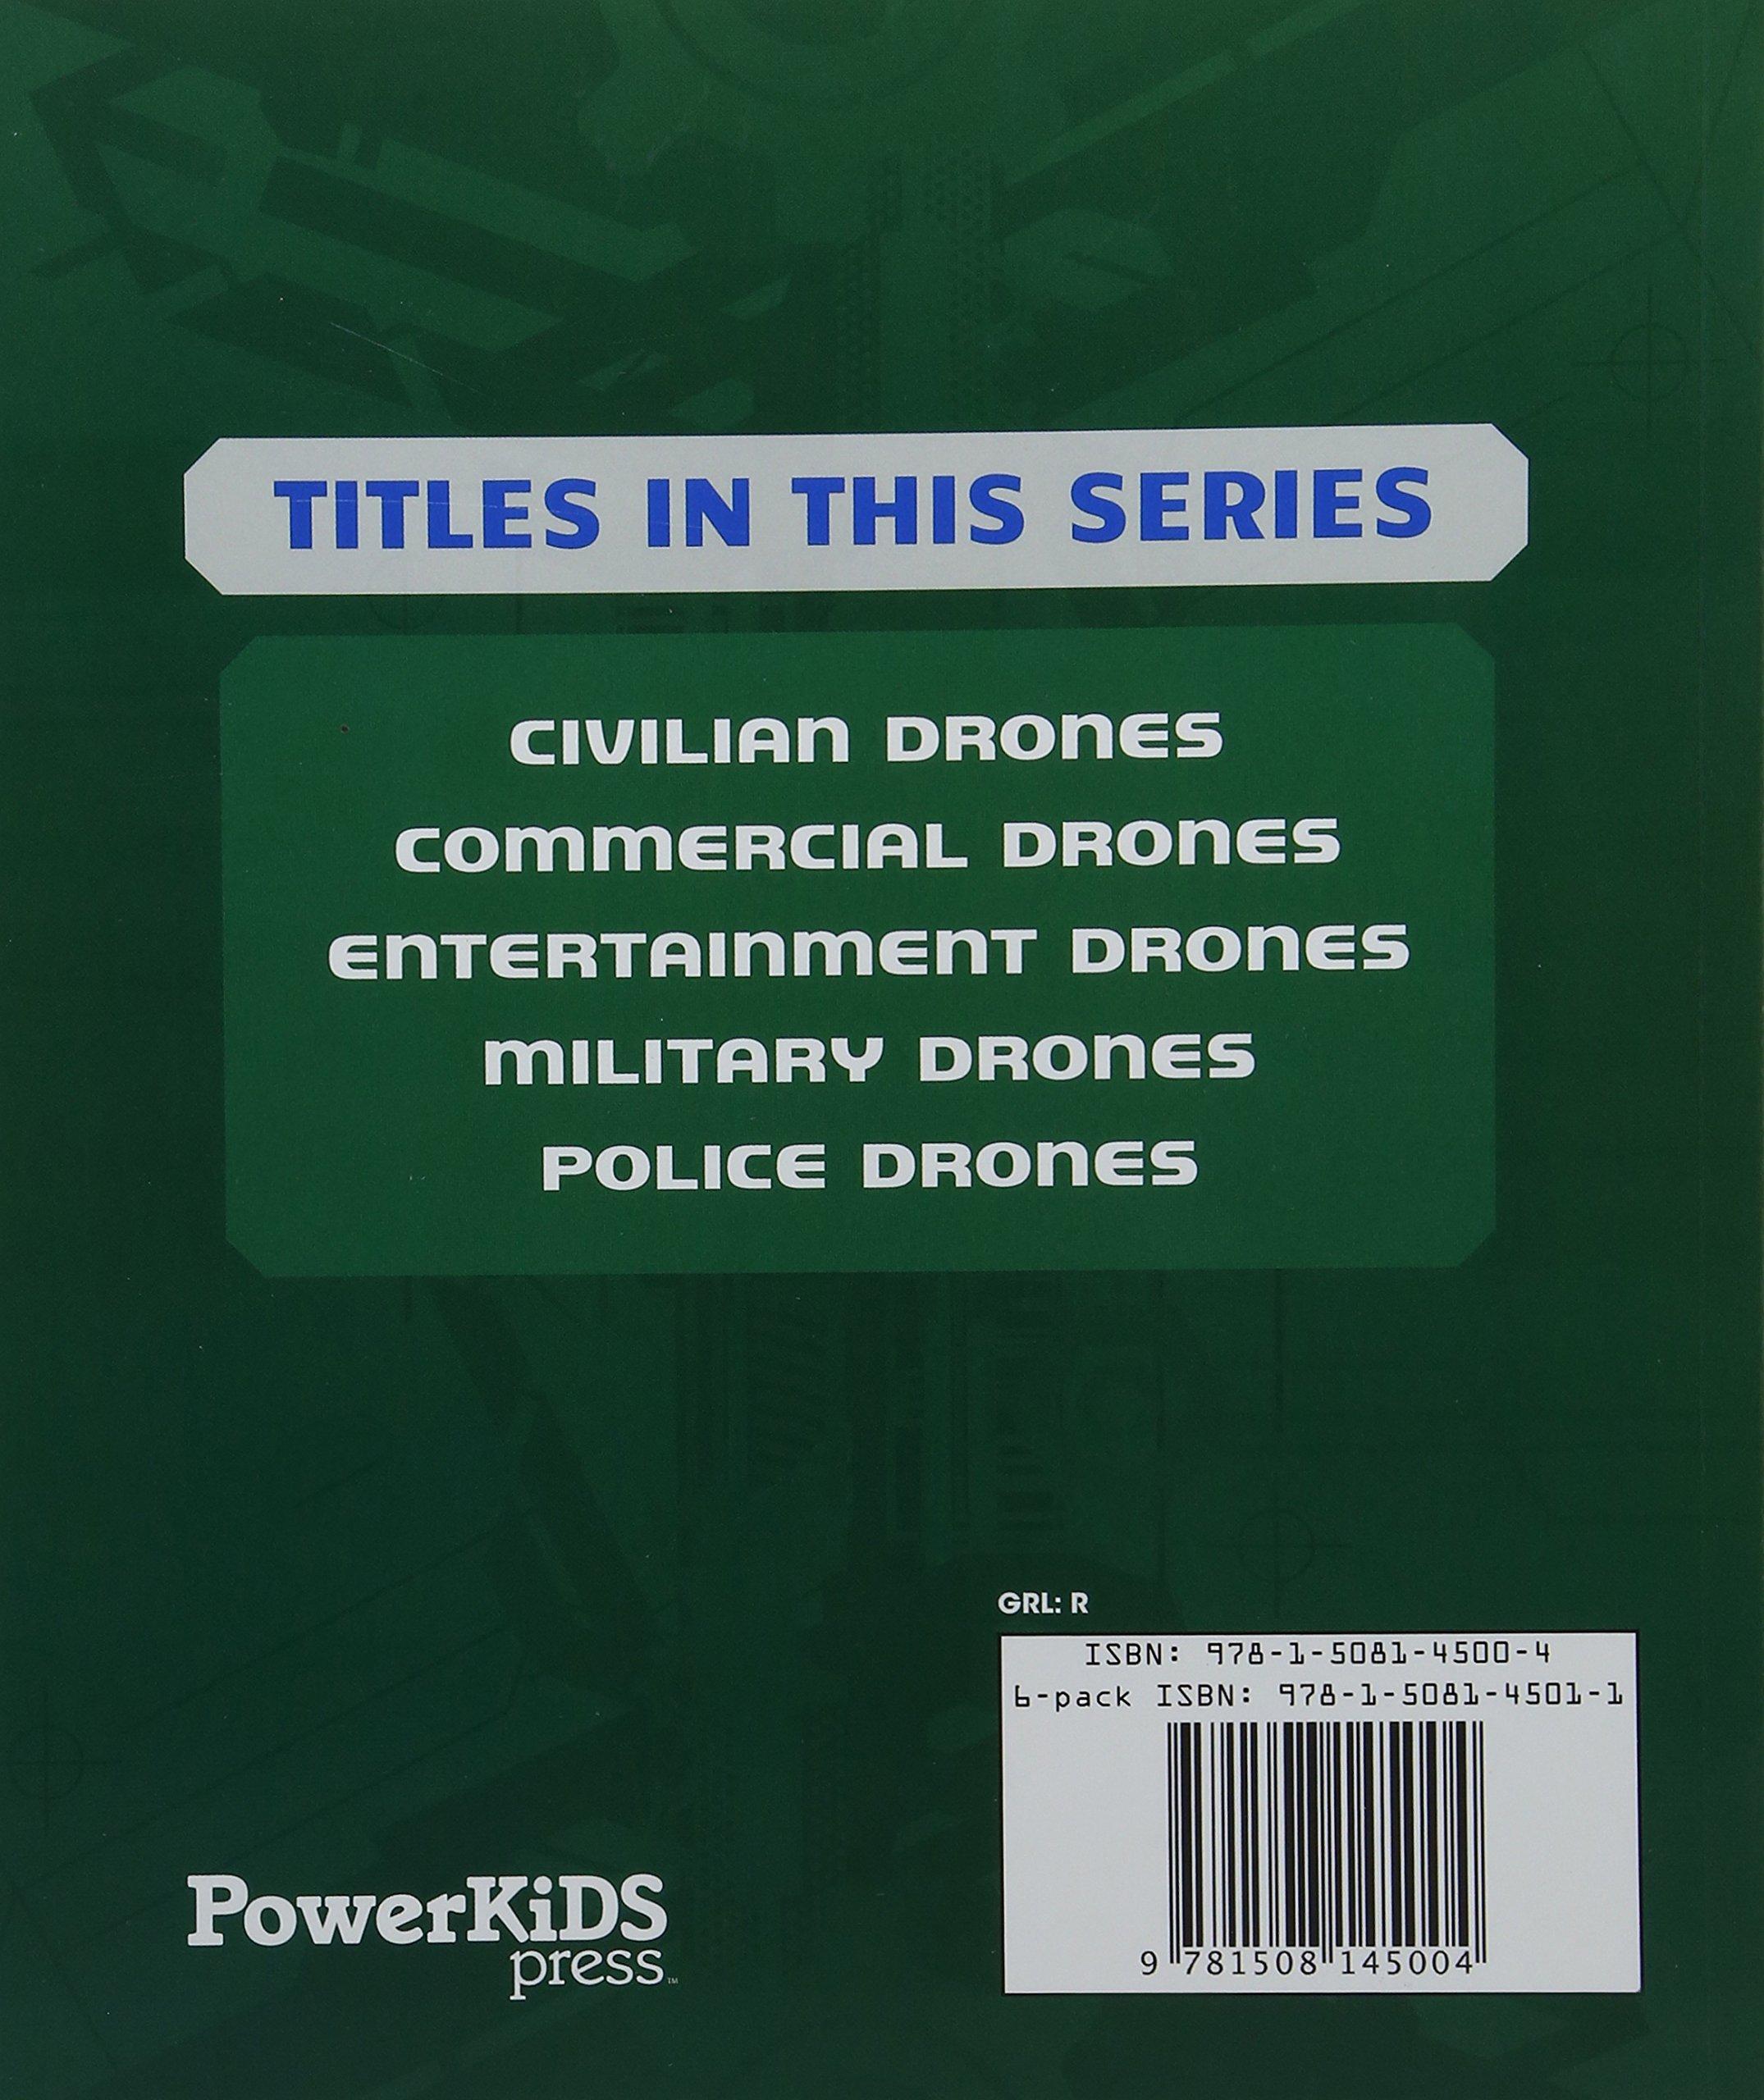 Police Drones (Drones: Eyes in the Skies) by PowerKids Press (Image #2)